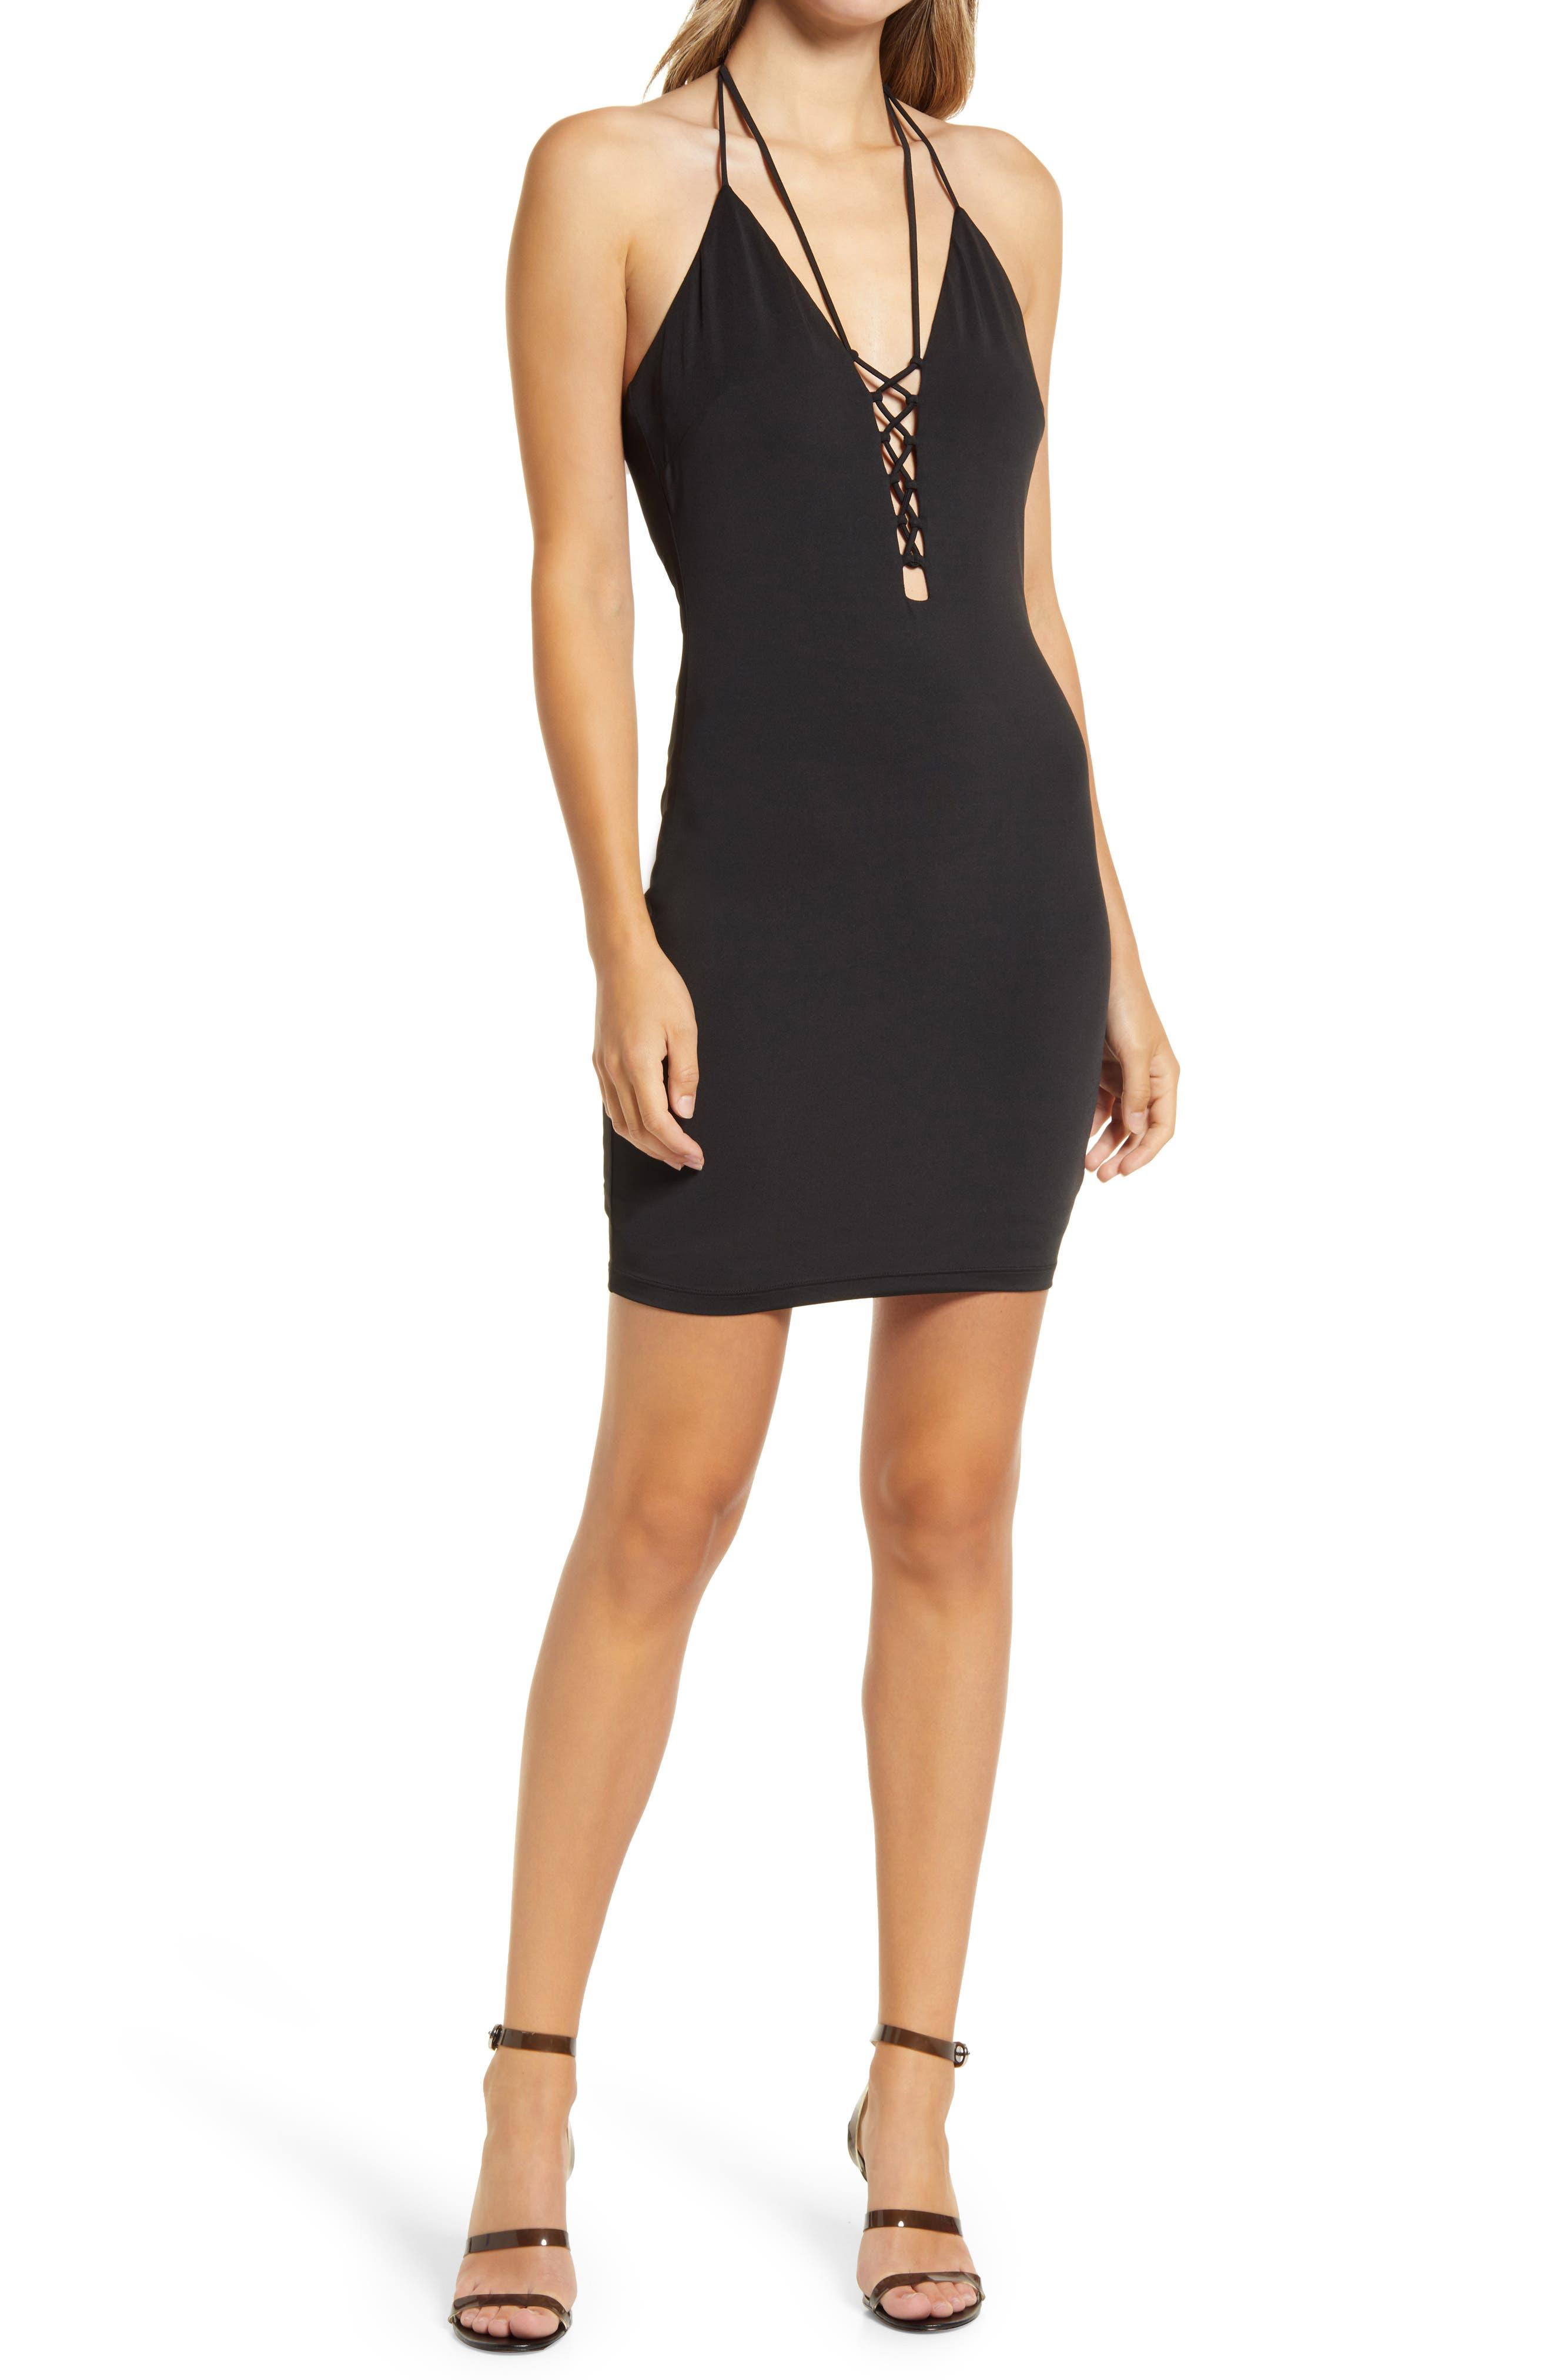 Lace-Up Double Strap Halter Dress